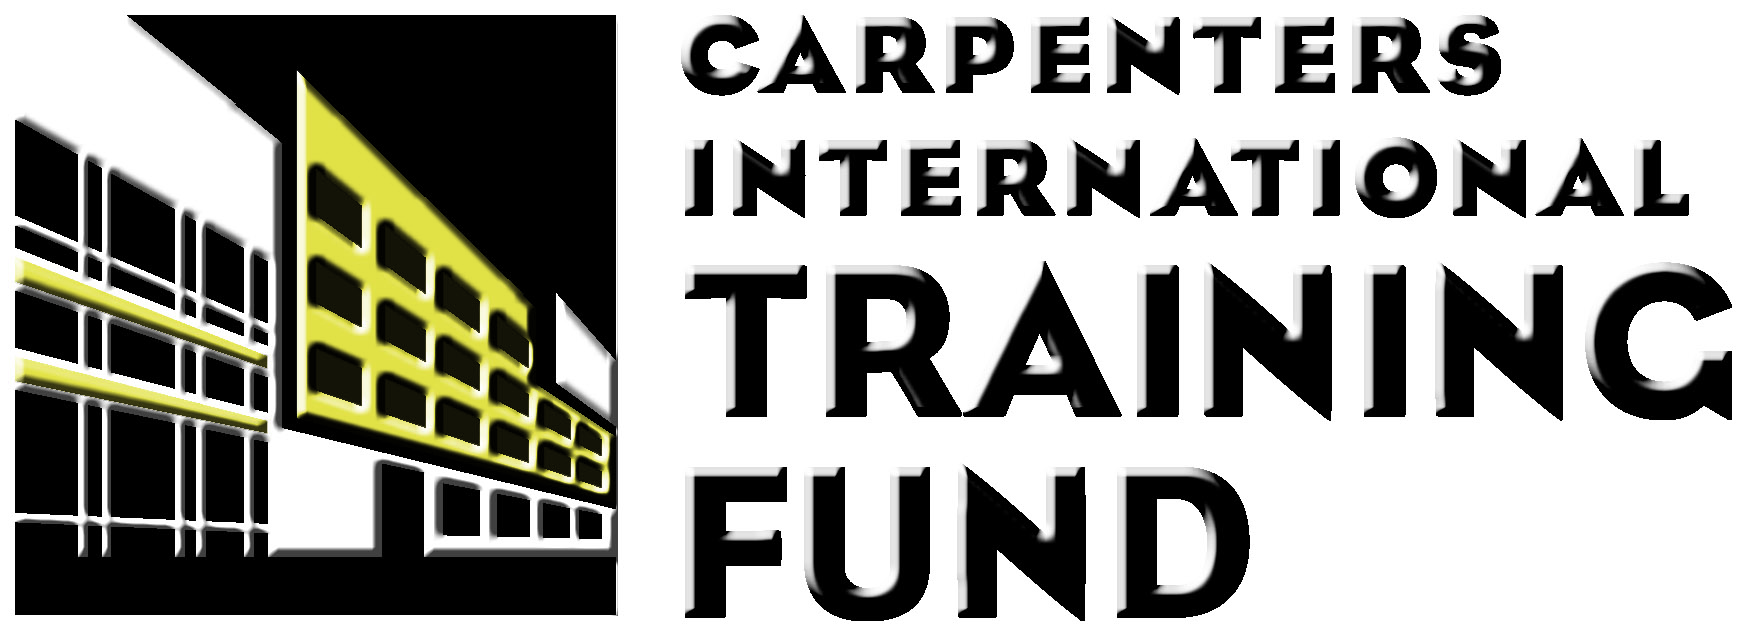 Carpenters International Training Fund logo